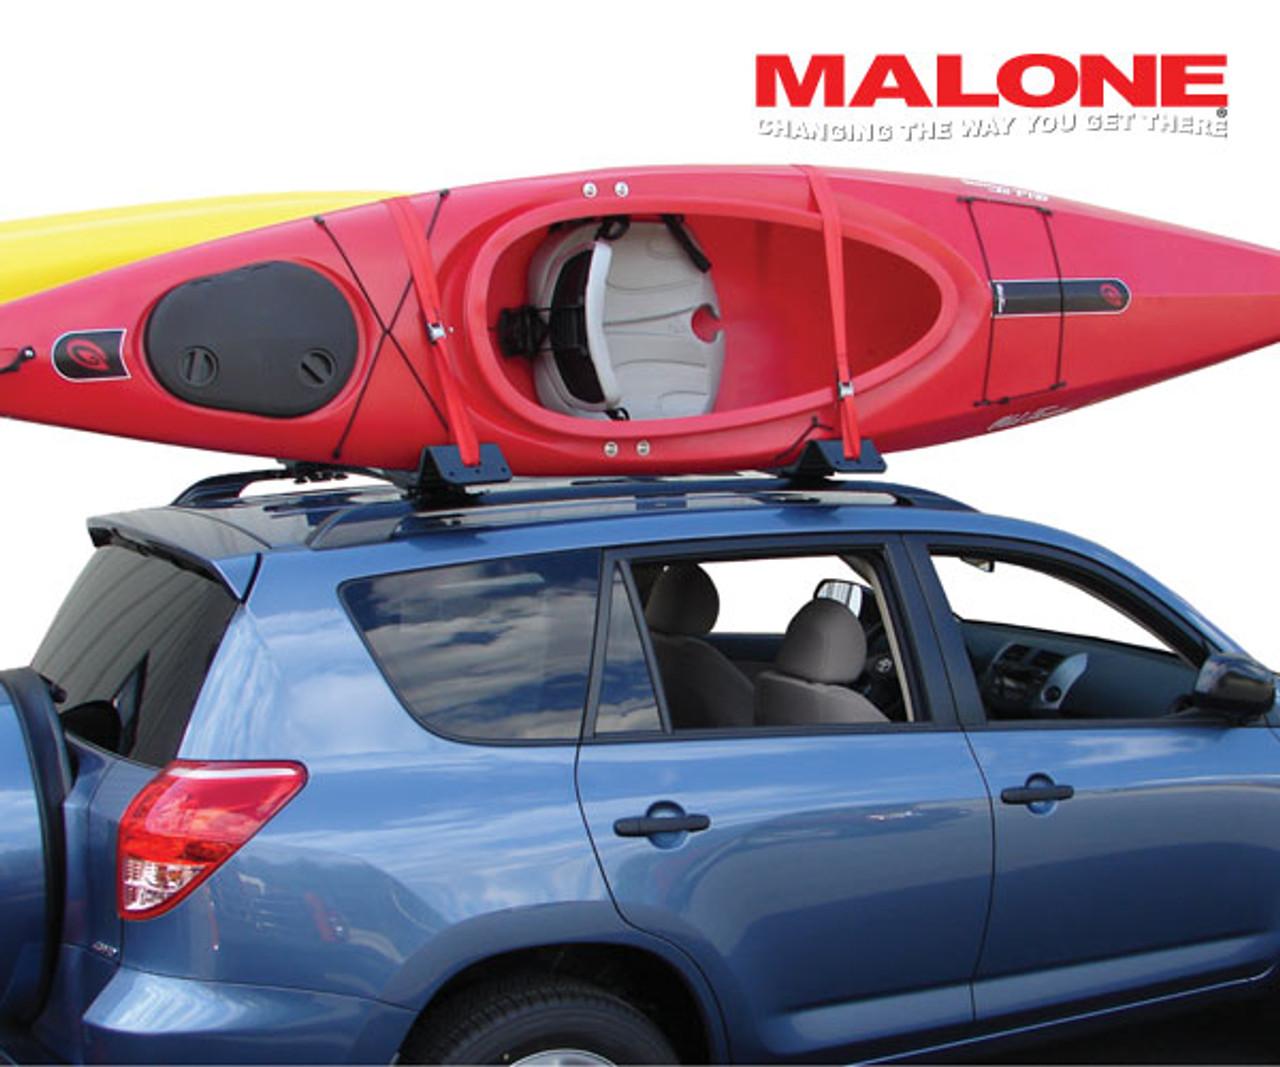 Universal Kayak Roof Rack Malone Autoloader